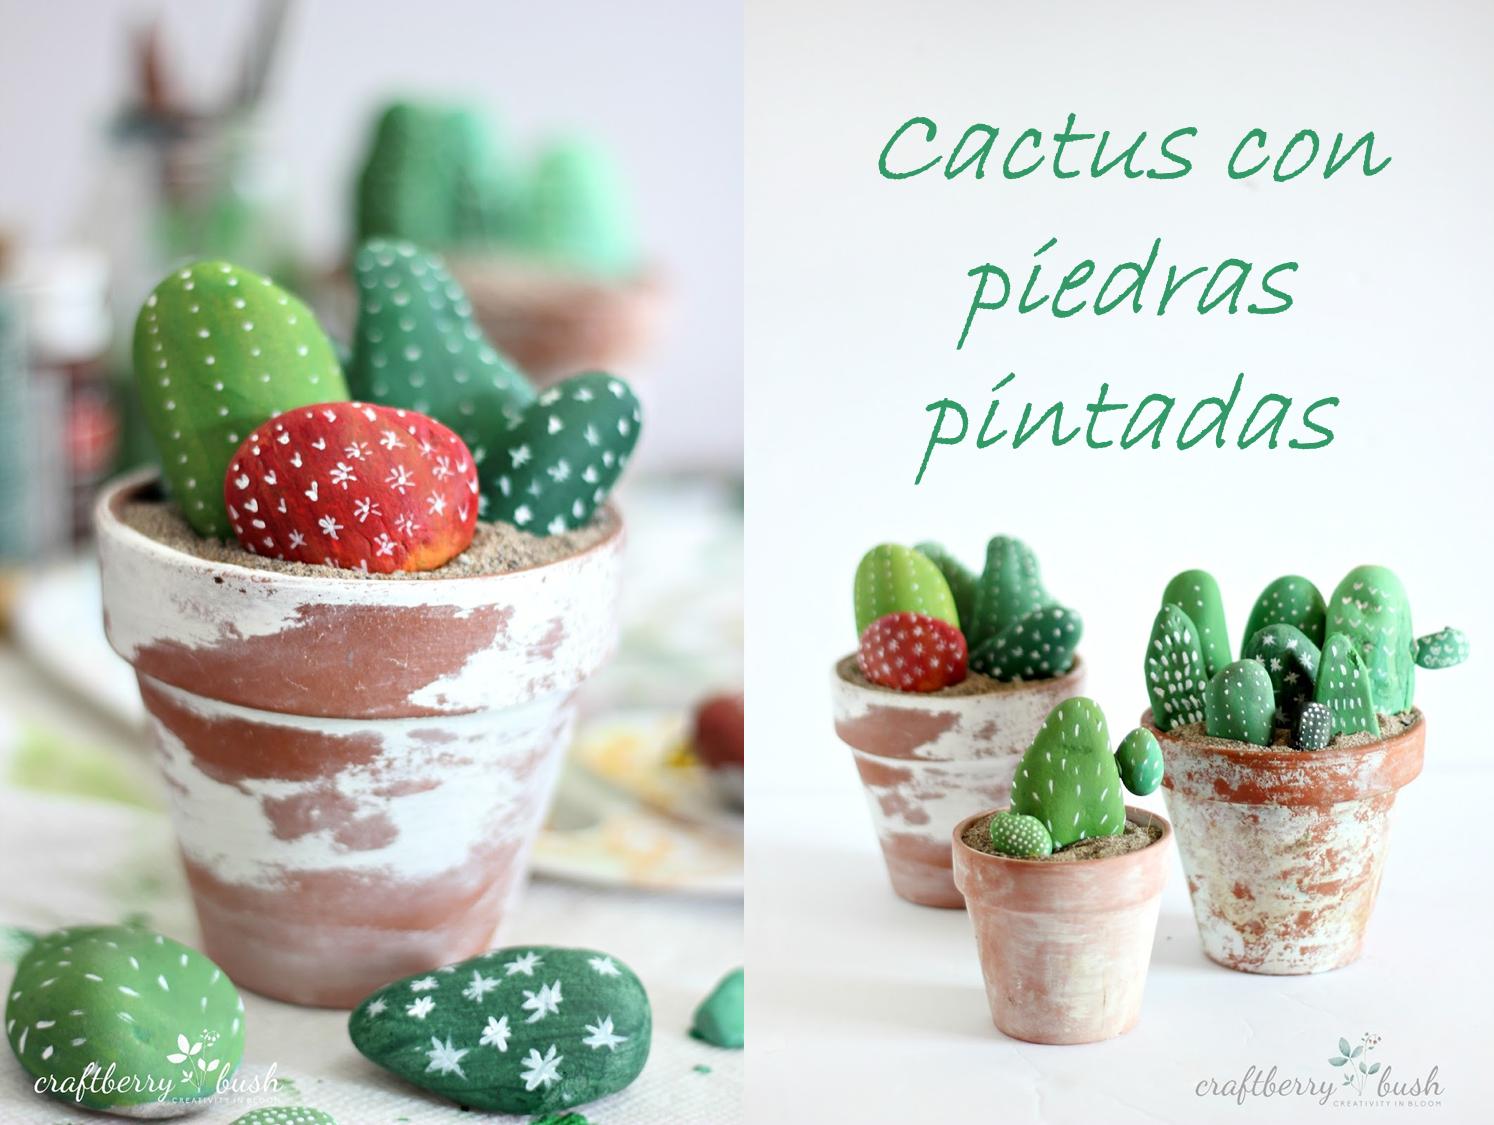 DIY: CACTUS CON PIEDRAS PINTADAS